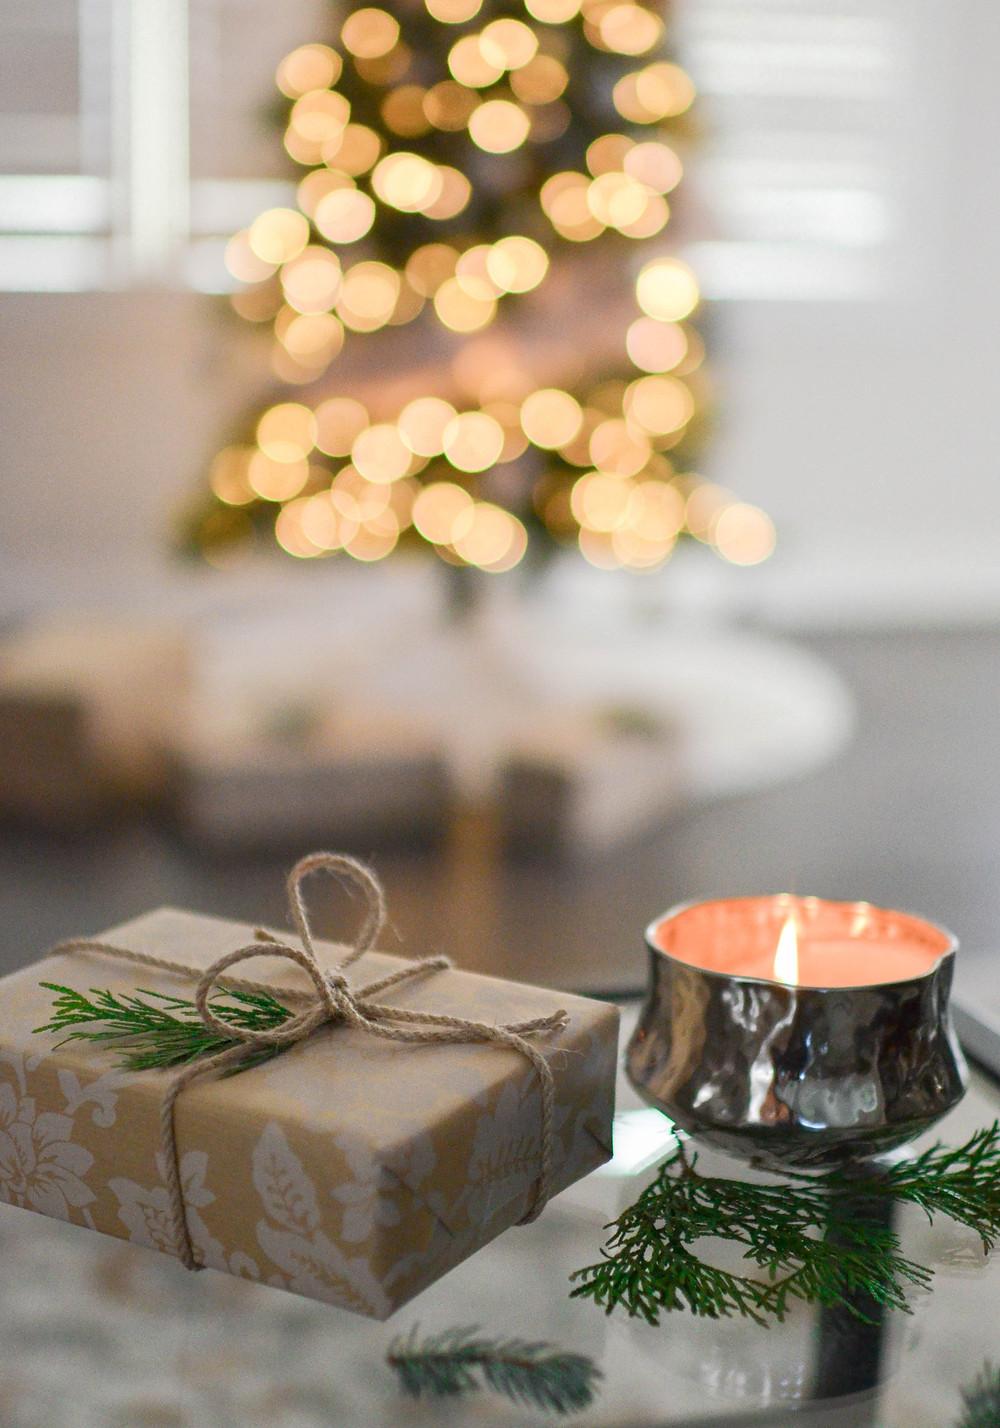 Christmas Present PelvicSanity